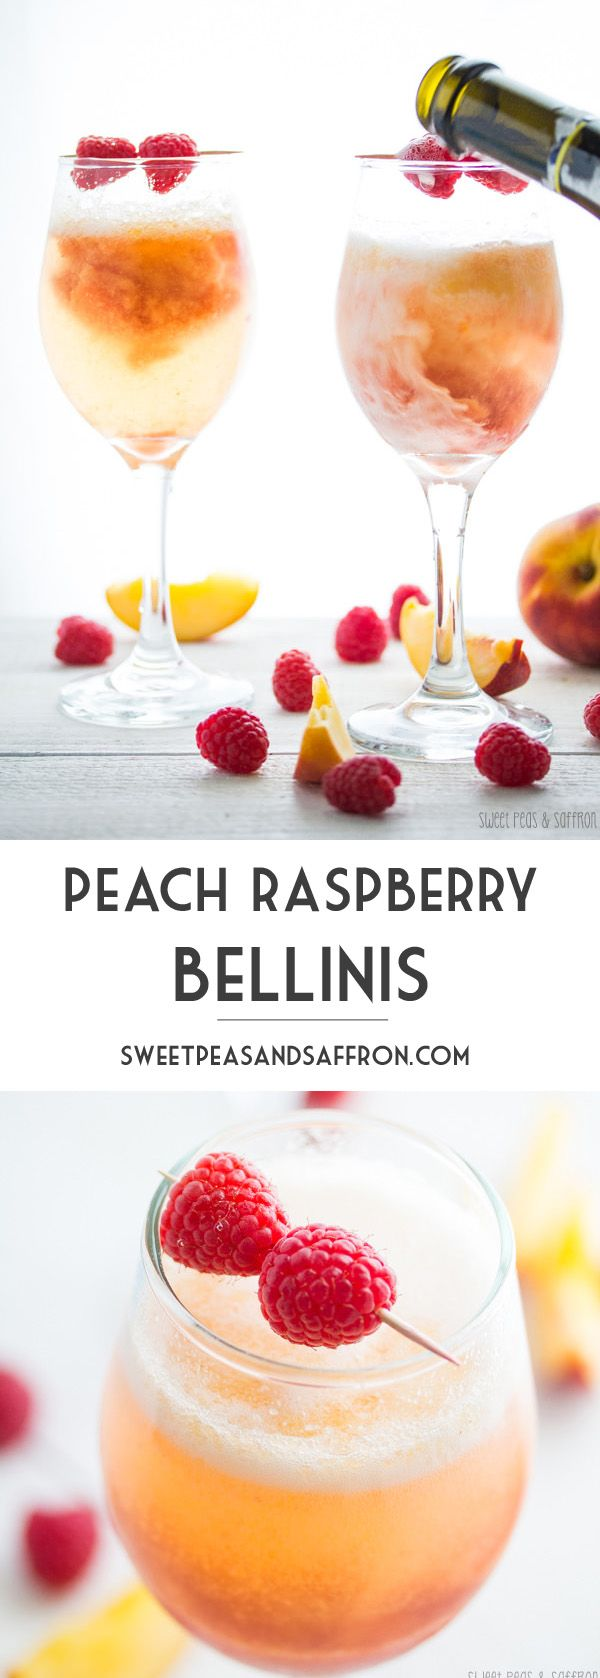 Peach & Raspberry Bellinis | sweetpeasandsaffron.com @sweetpeasaffron